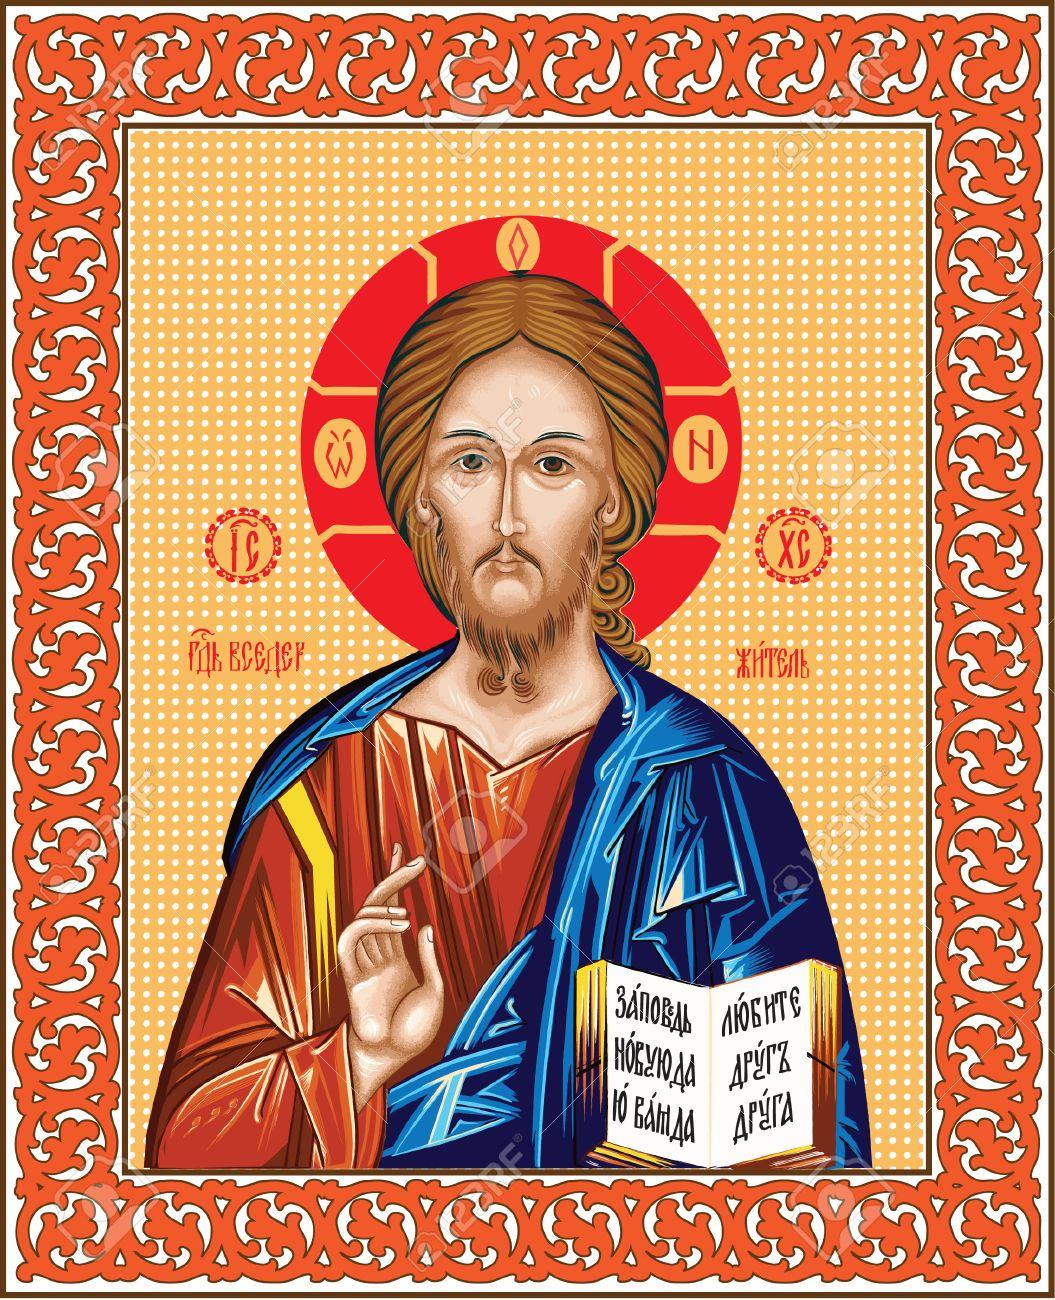 2b462882953 lord god s wisdom serigraph style icon image Stock Photo - 51224657